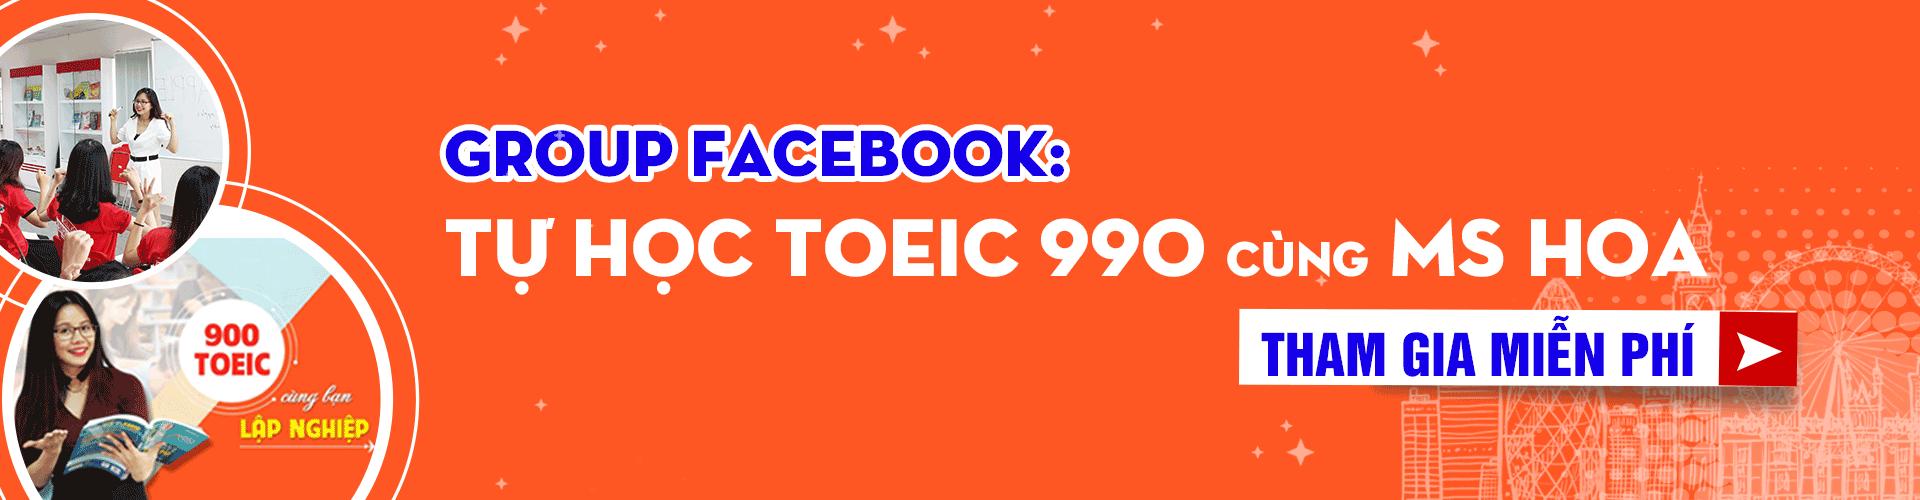 Group tự học toeic 990